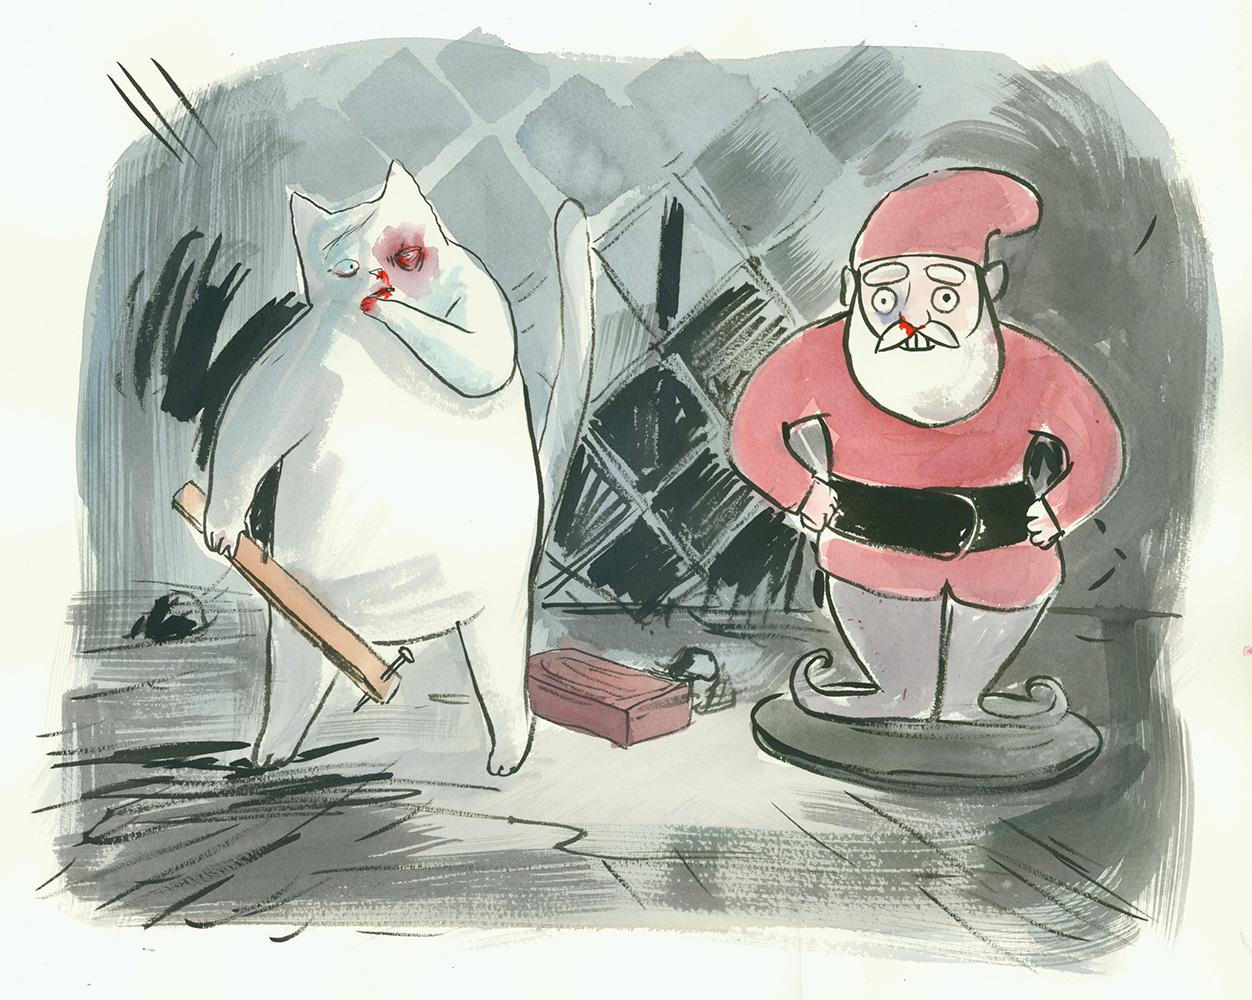 AI 29 2010 - ARTIST: Graham RoumieuTITLE: Gnome Santa